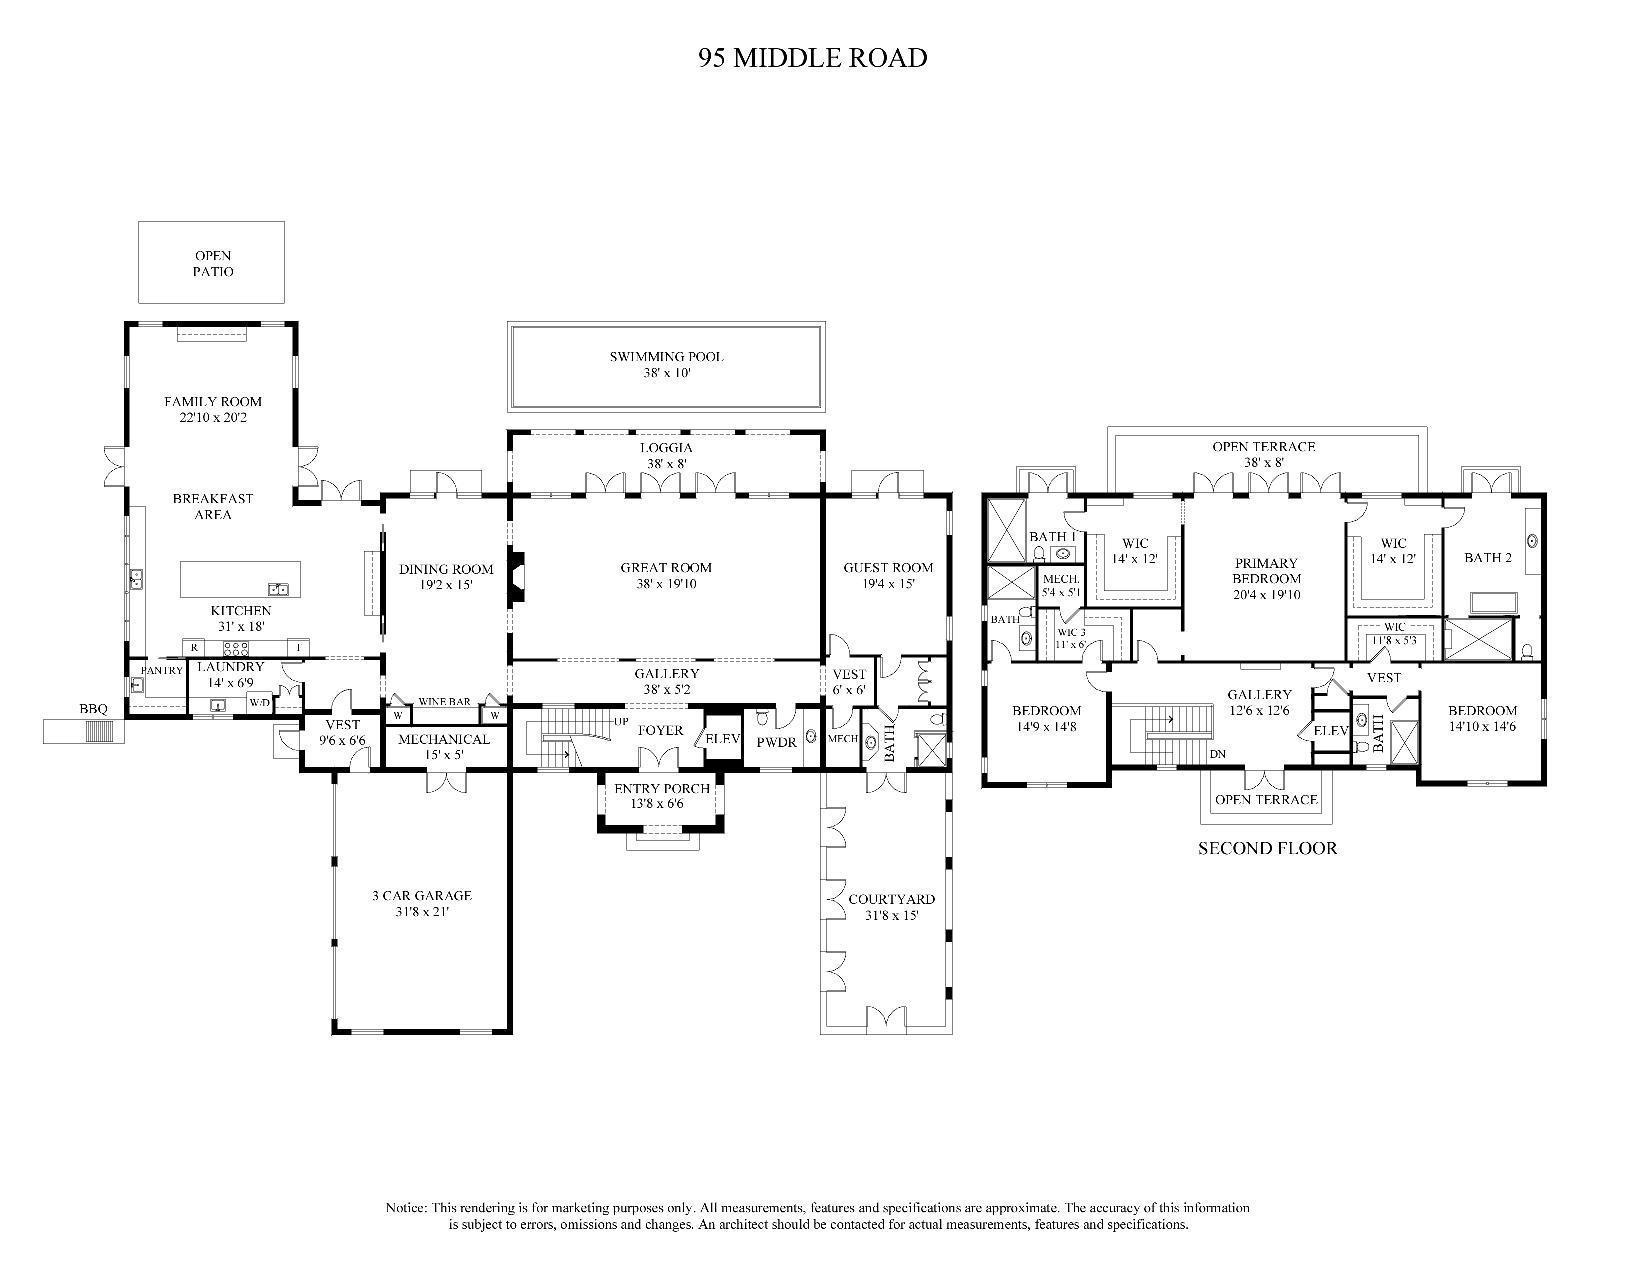 95 MIDDLE ROAD Revised floorplan-page-00